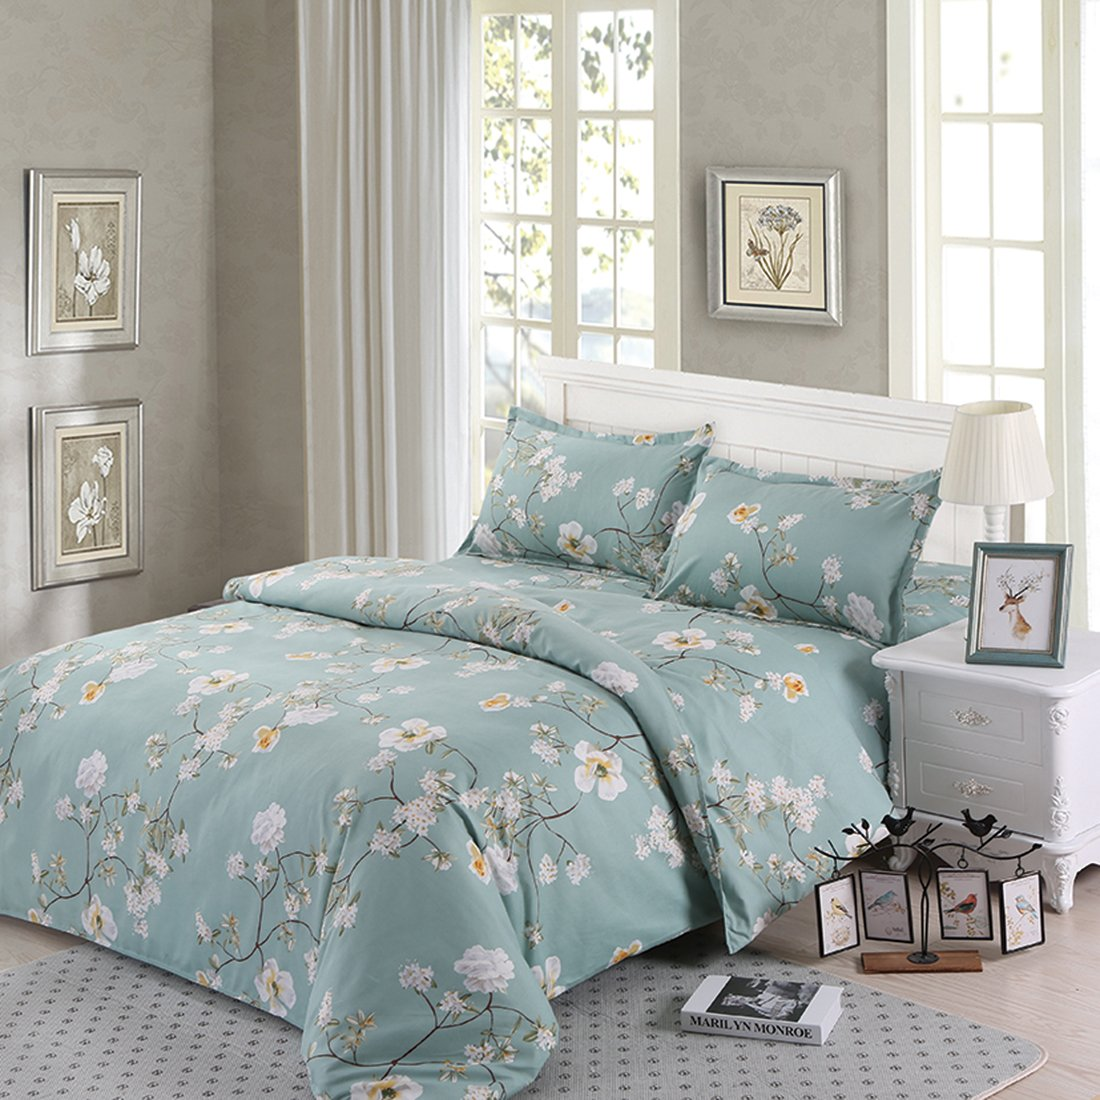 bedding duvet cover set queen 3 pieces 800 thread floral hypoallergenic 611434177116 ebay. Black Bedroom Furniture Sets. Home Design Ideas